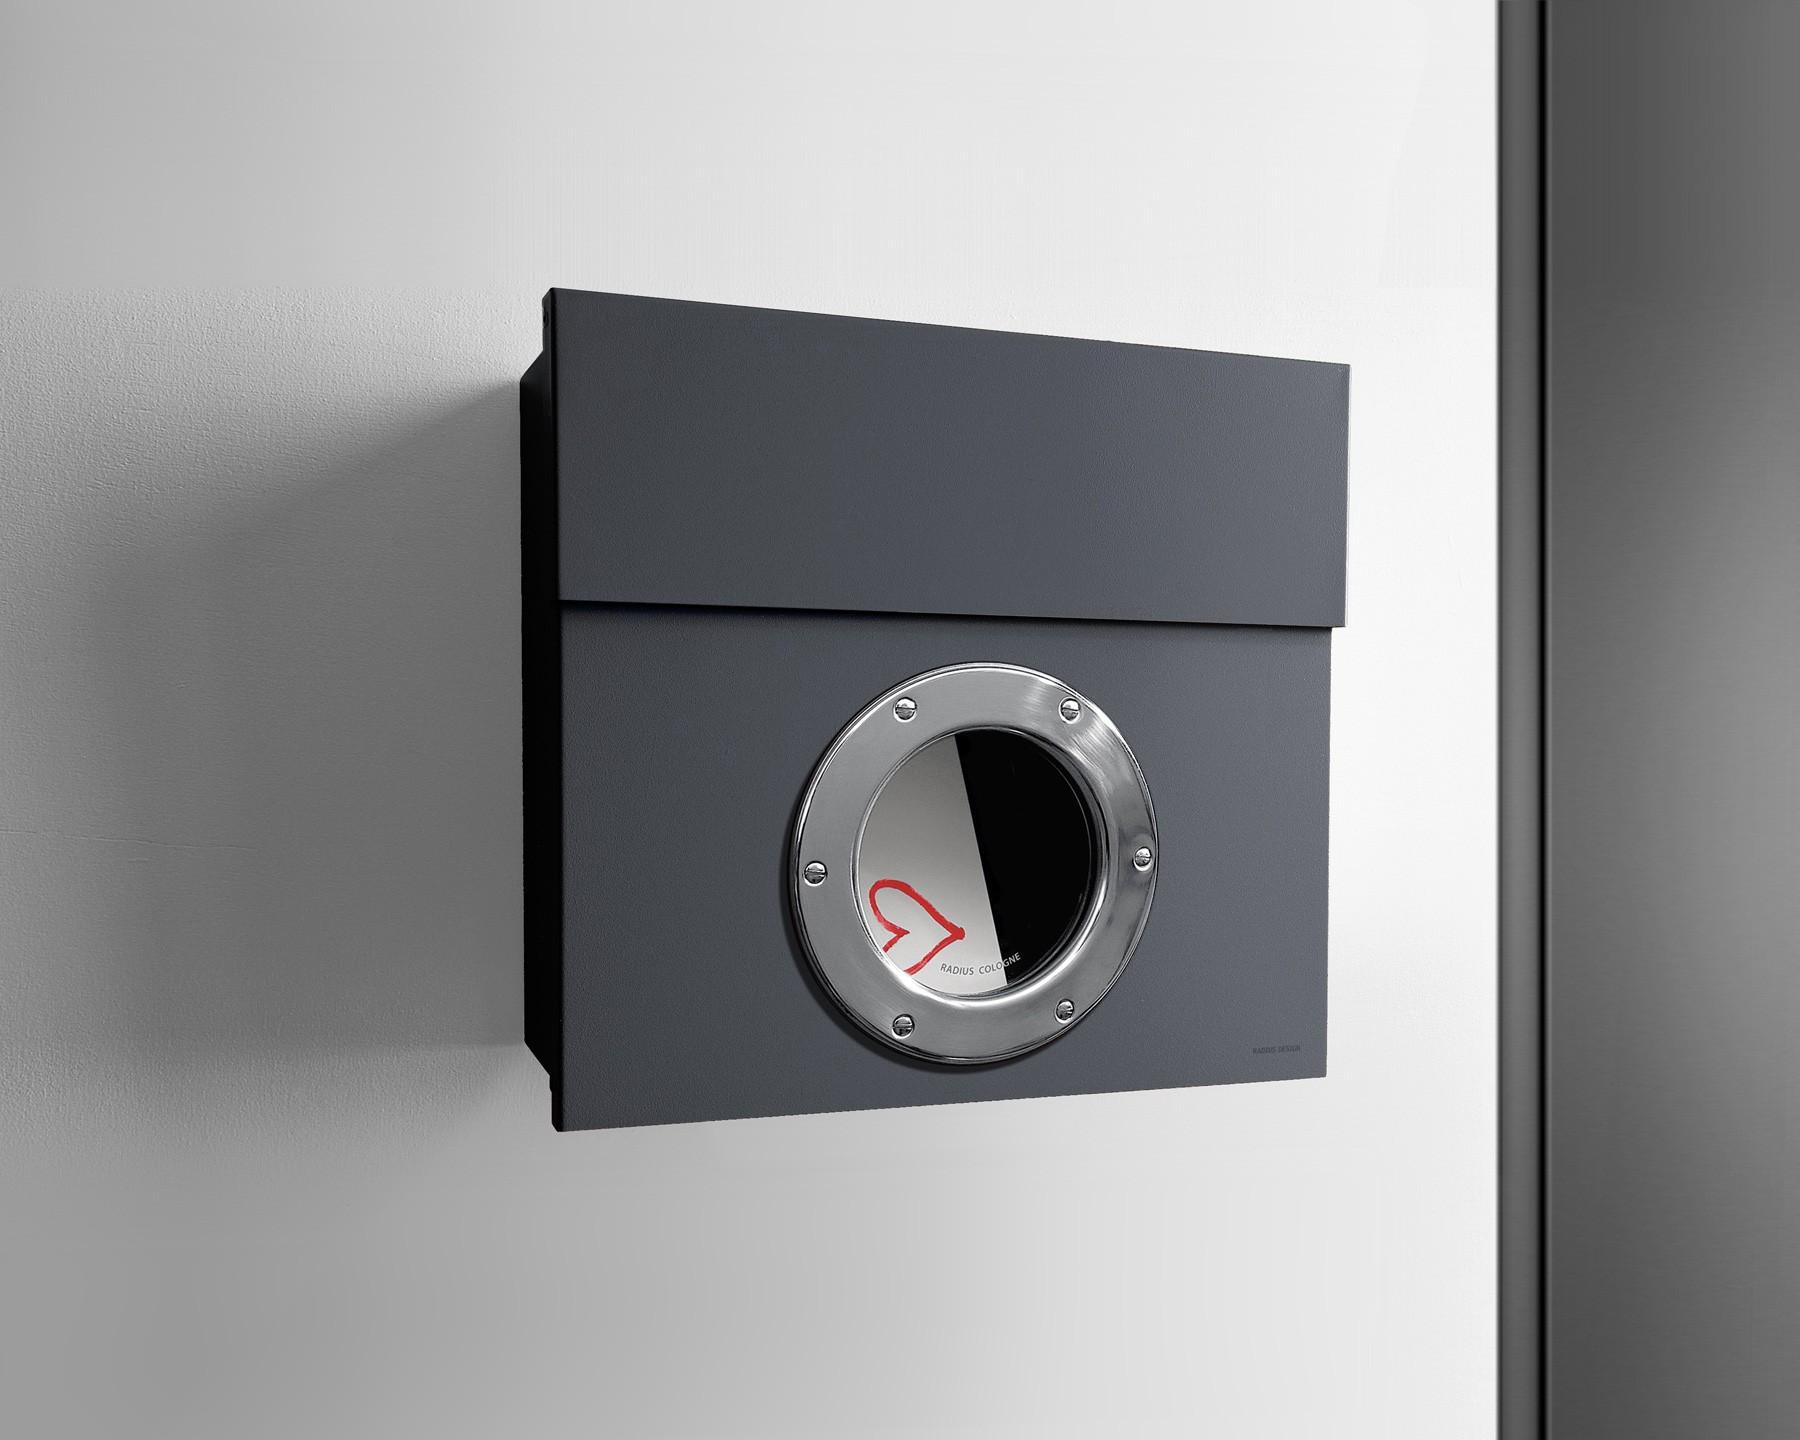 radius briefkasten letterman 1 anthrazitgrau ral 7016 mit. Black Bedroom Furniture Sets. Home Design Ideas